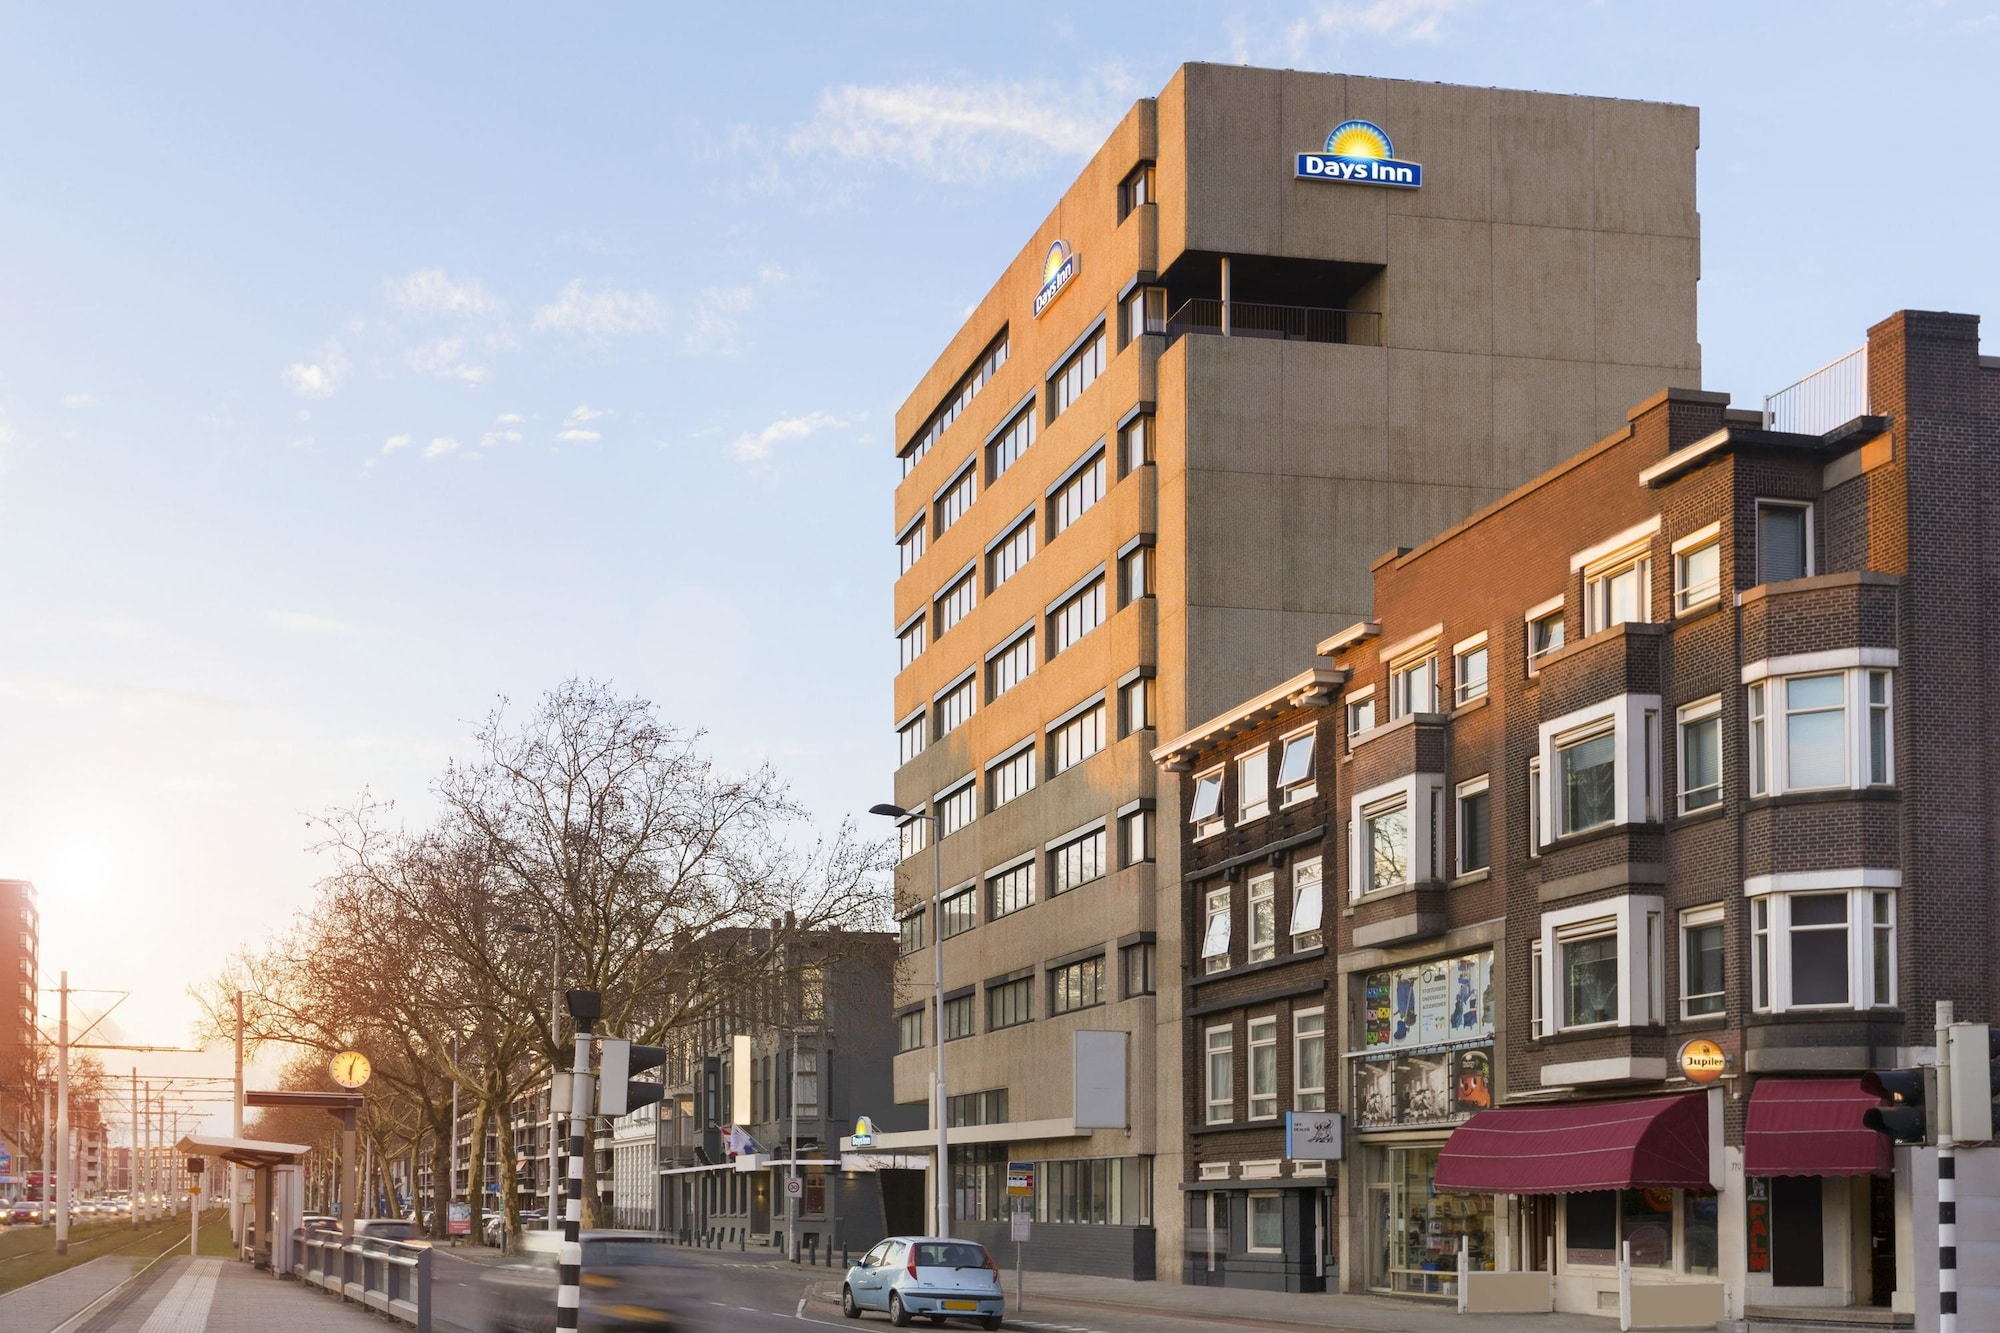 Days Inn Rotterdam City Centre, Rotterdam